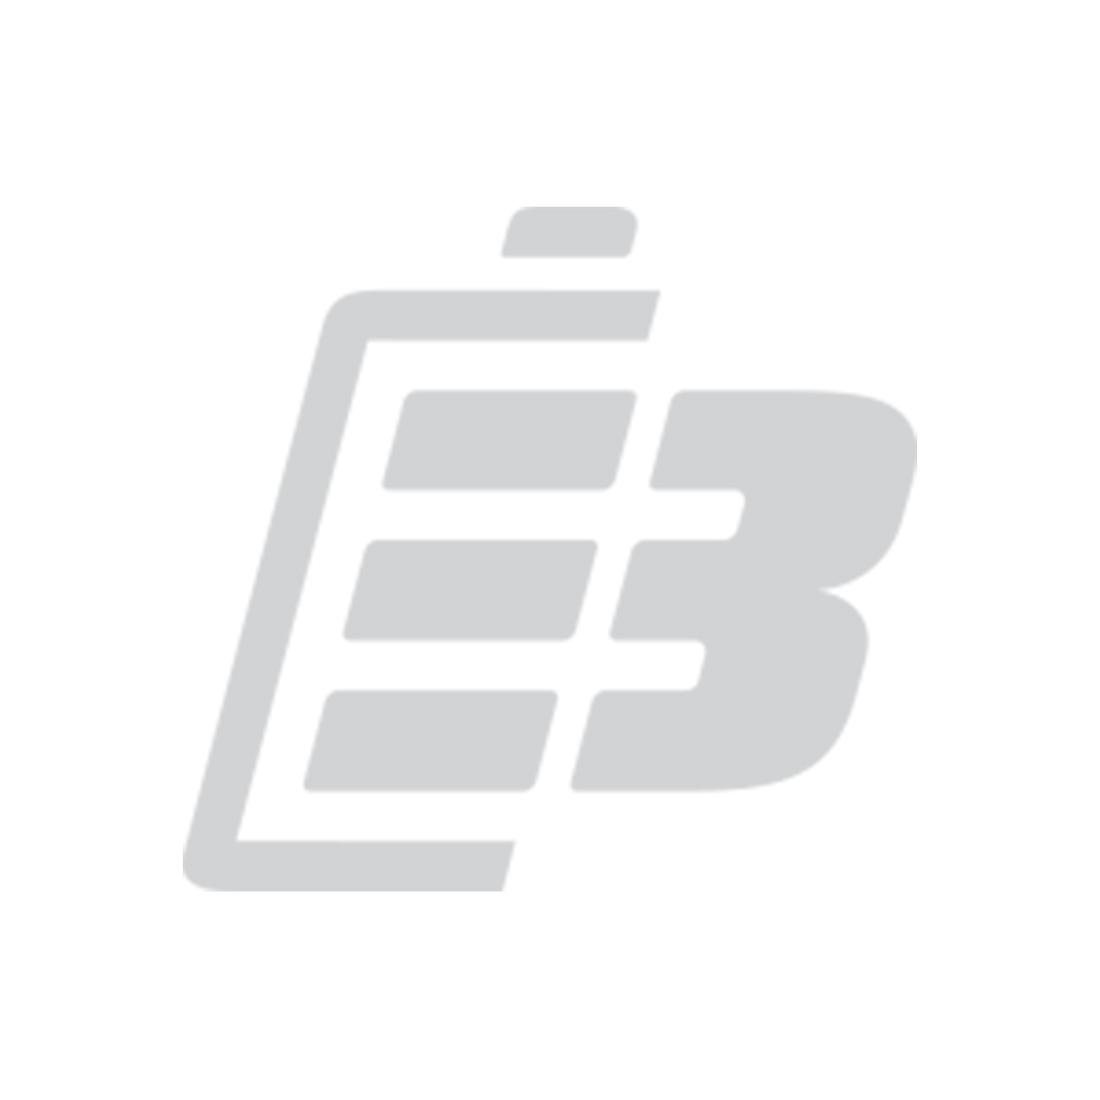 Smartphone battery Sony Xperia P_N1